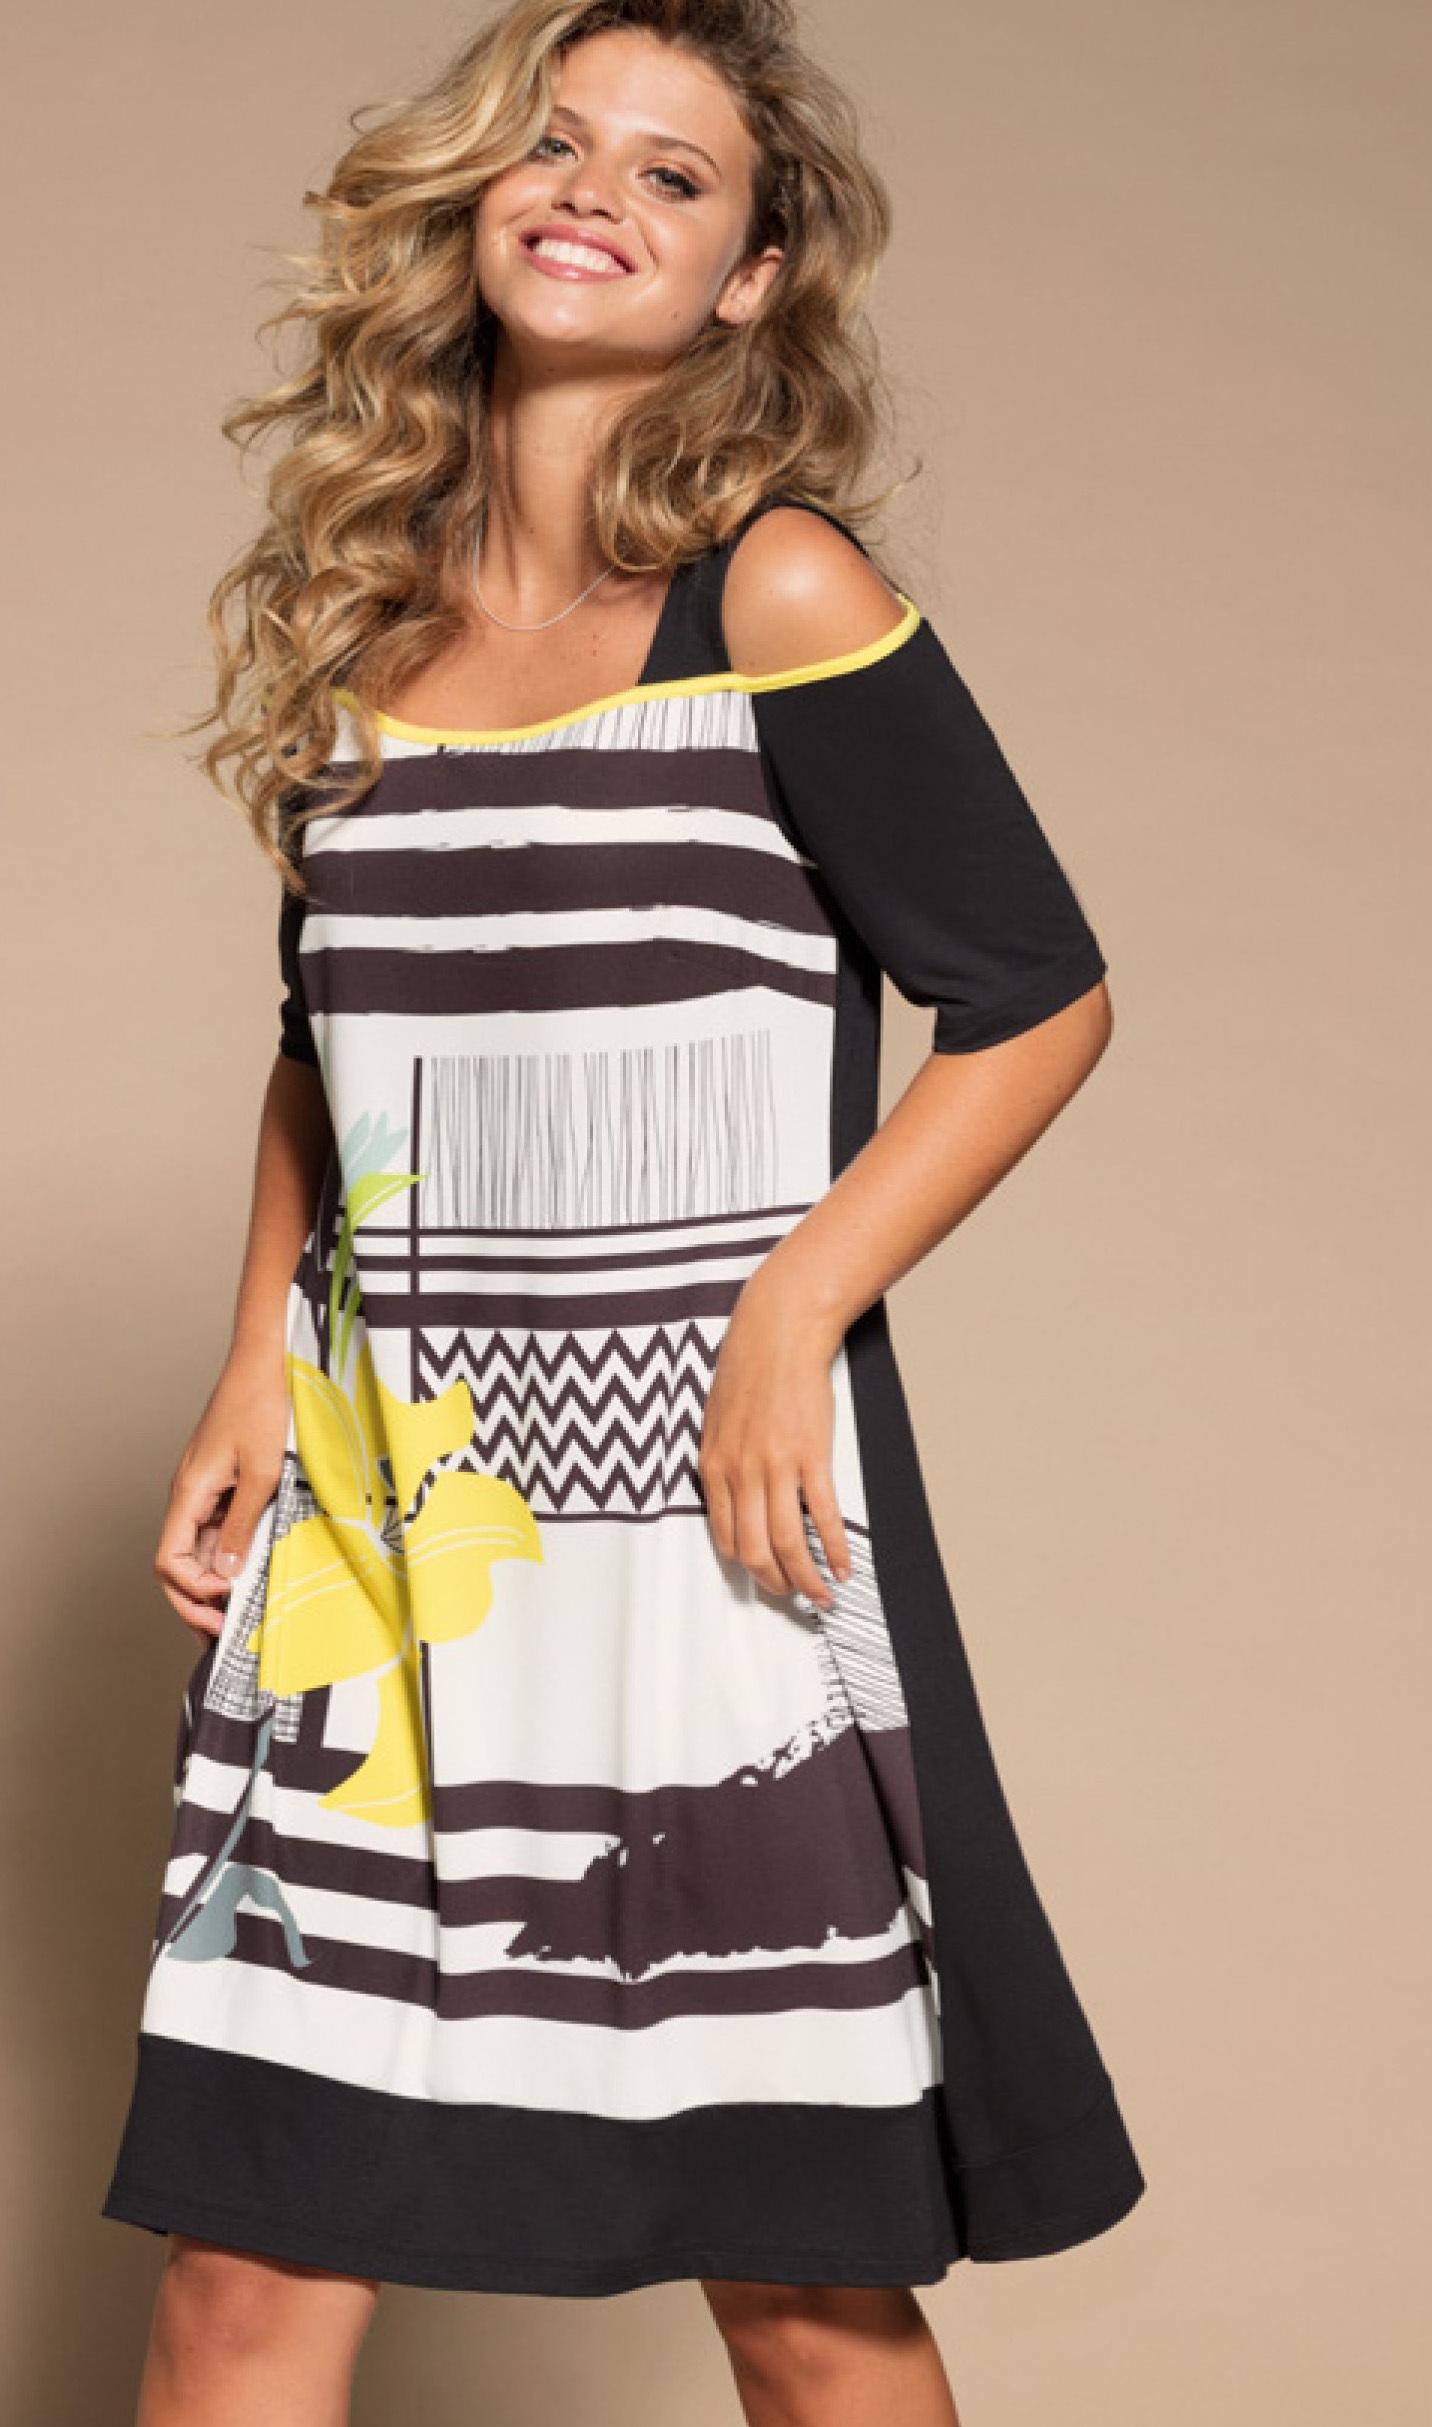 Maloka: Lemon Lime Marble Cold Shoulder Dress/Tunic (1 Left!) MK_NAEMI_N